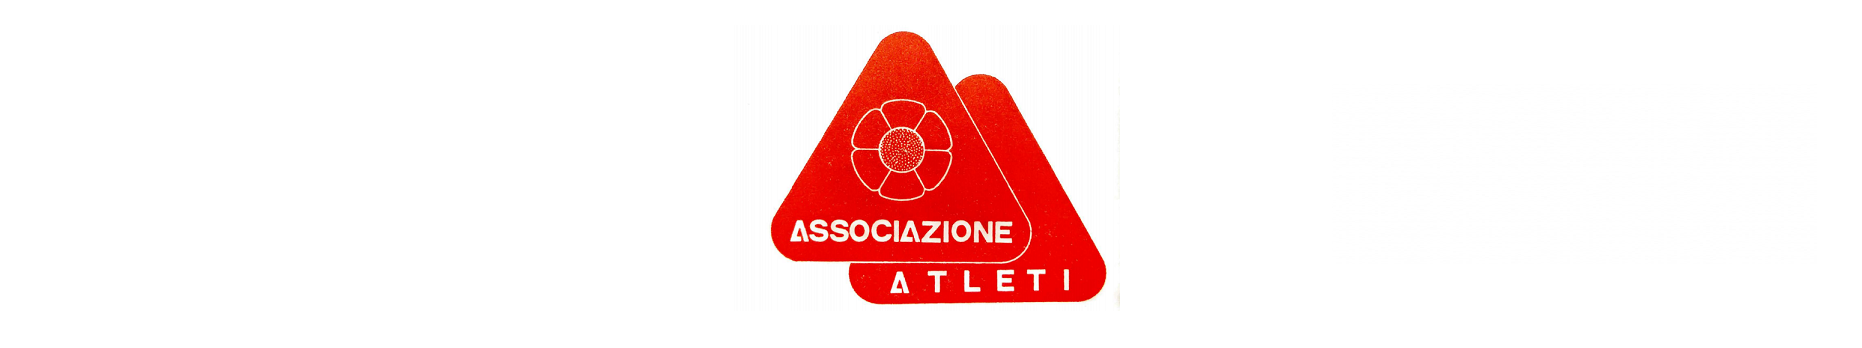 Associazione atleti CONI - LIBERTAS - logo